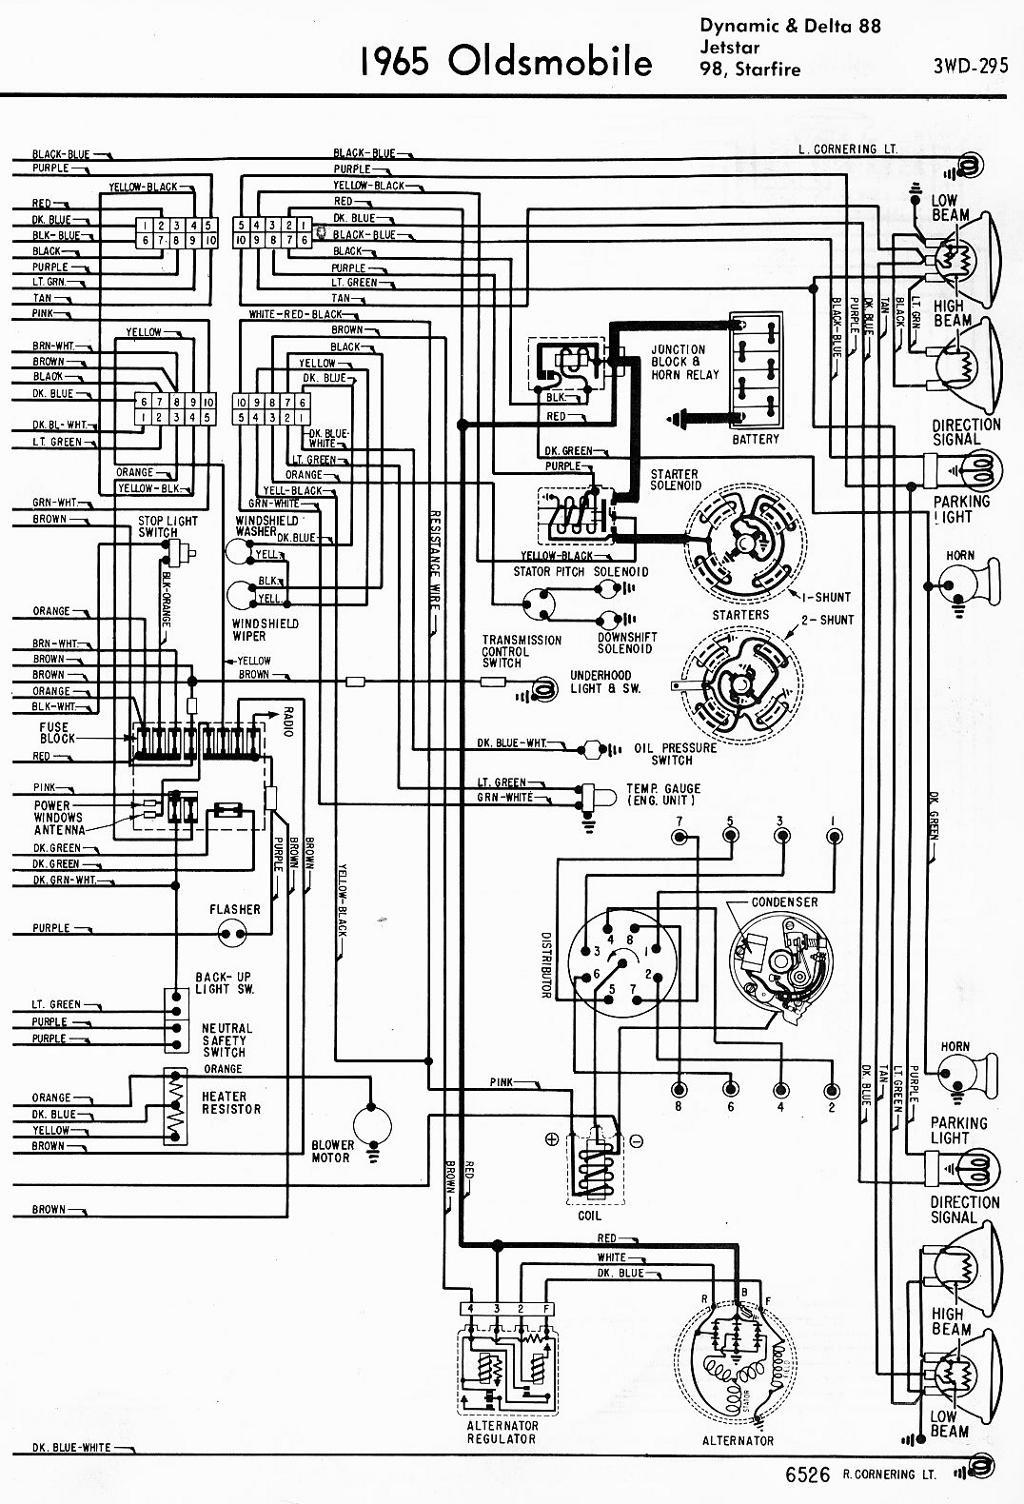 medium resolution of 2008 nissan pathfinder instrument panel wiring diagram 1977 celica interior 1977 toyota celica wiring diagram